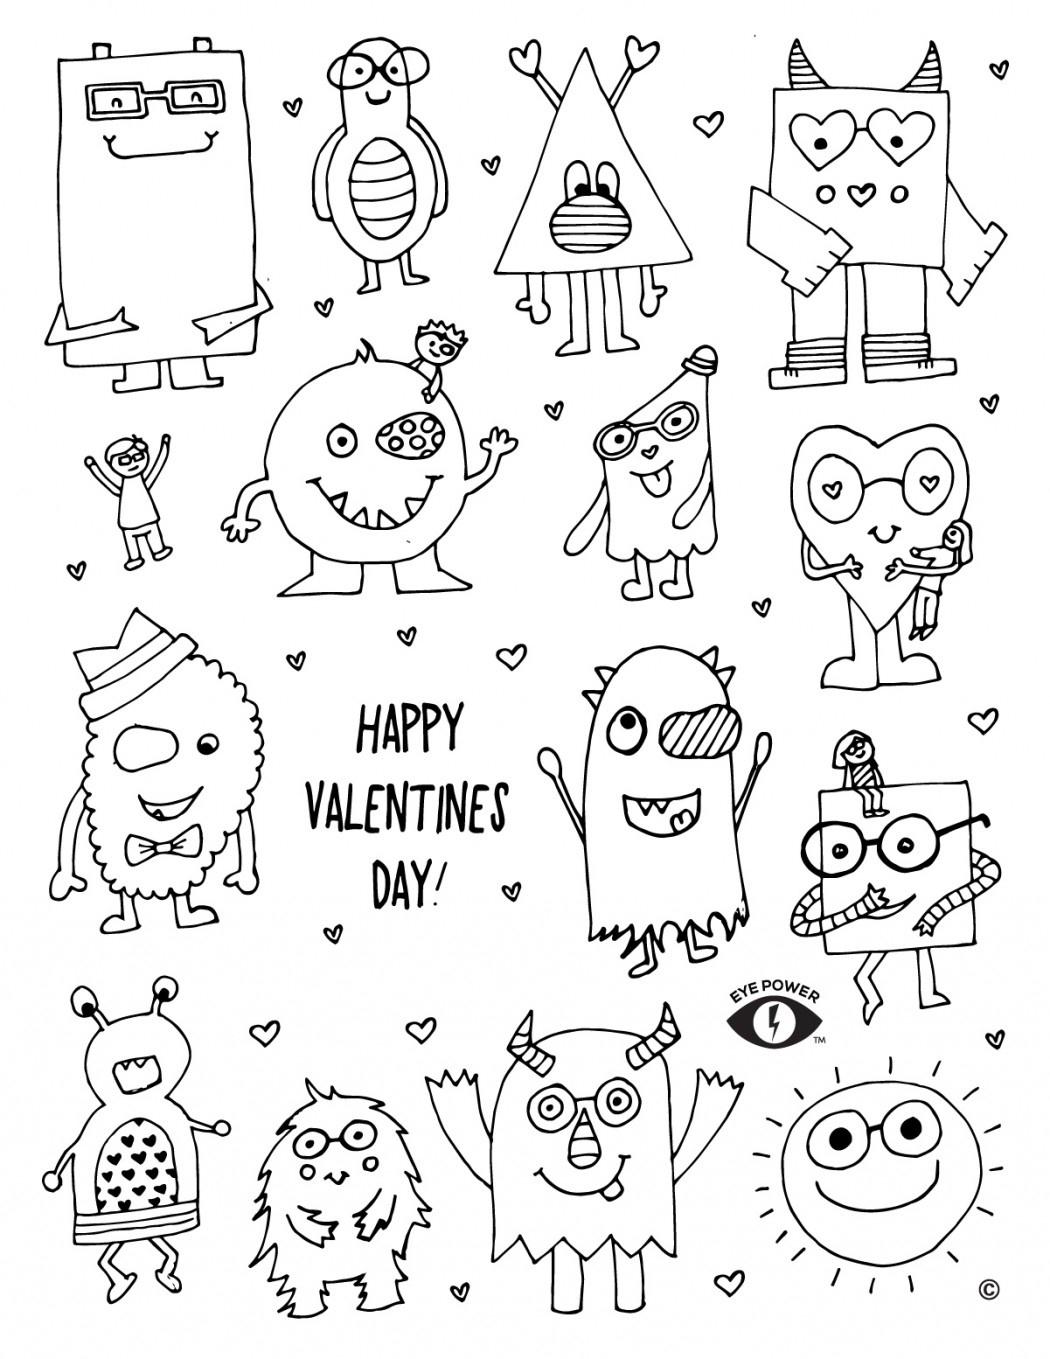 Free Valentines Coloring Page Printable - Eye Power Kids Wear - Free Printable Valentine Coloring Pages